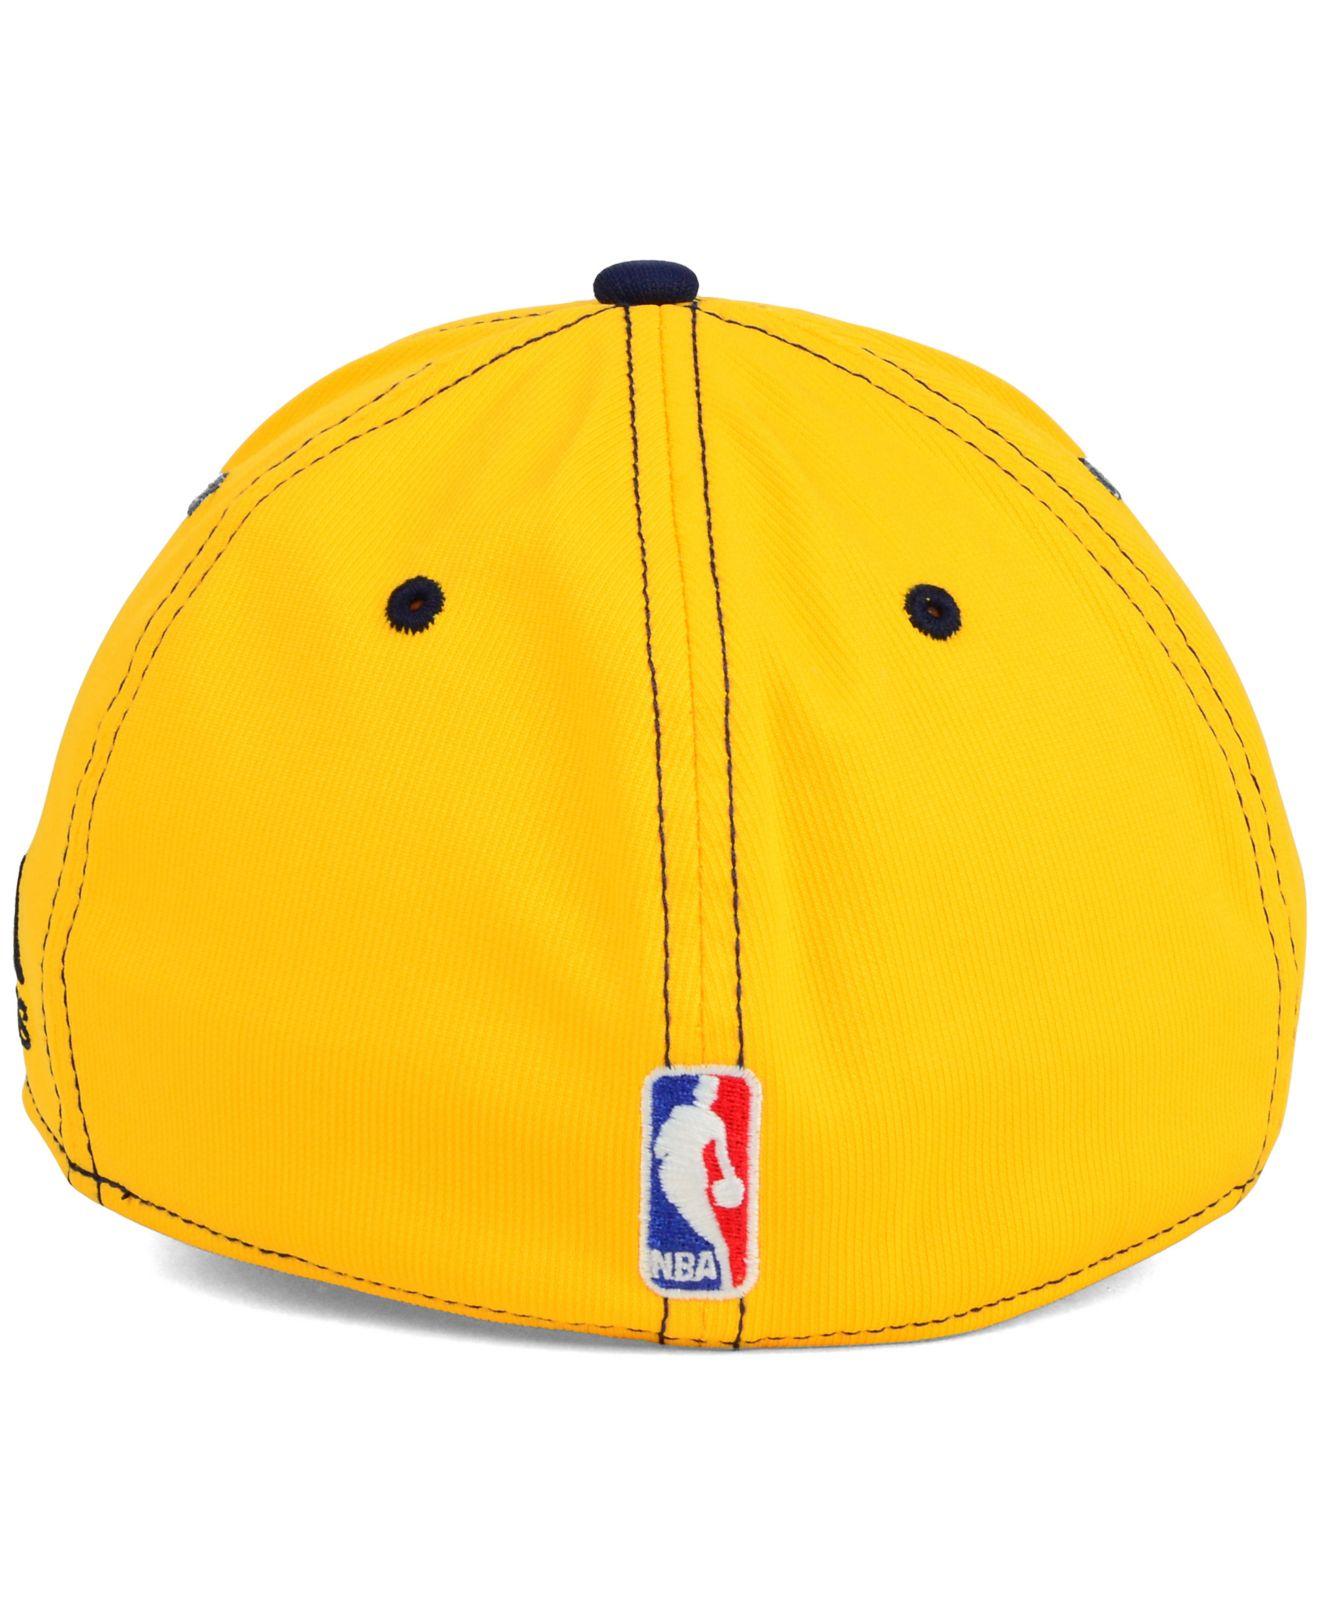 Adidas Denver Nuggets 3 Stripe Jacket: Adidas Denver Nuggets 2-Tone Flex Cap In Yellow For Men